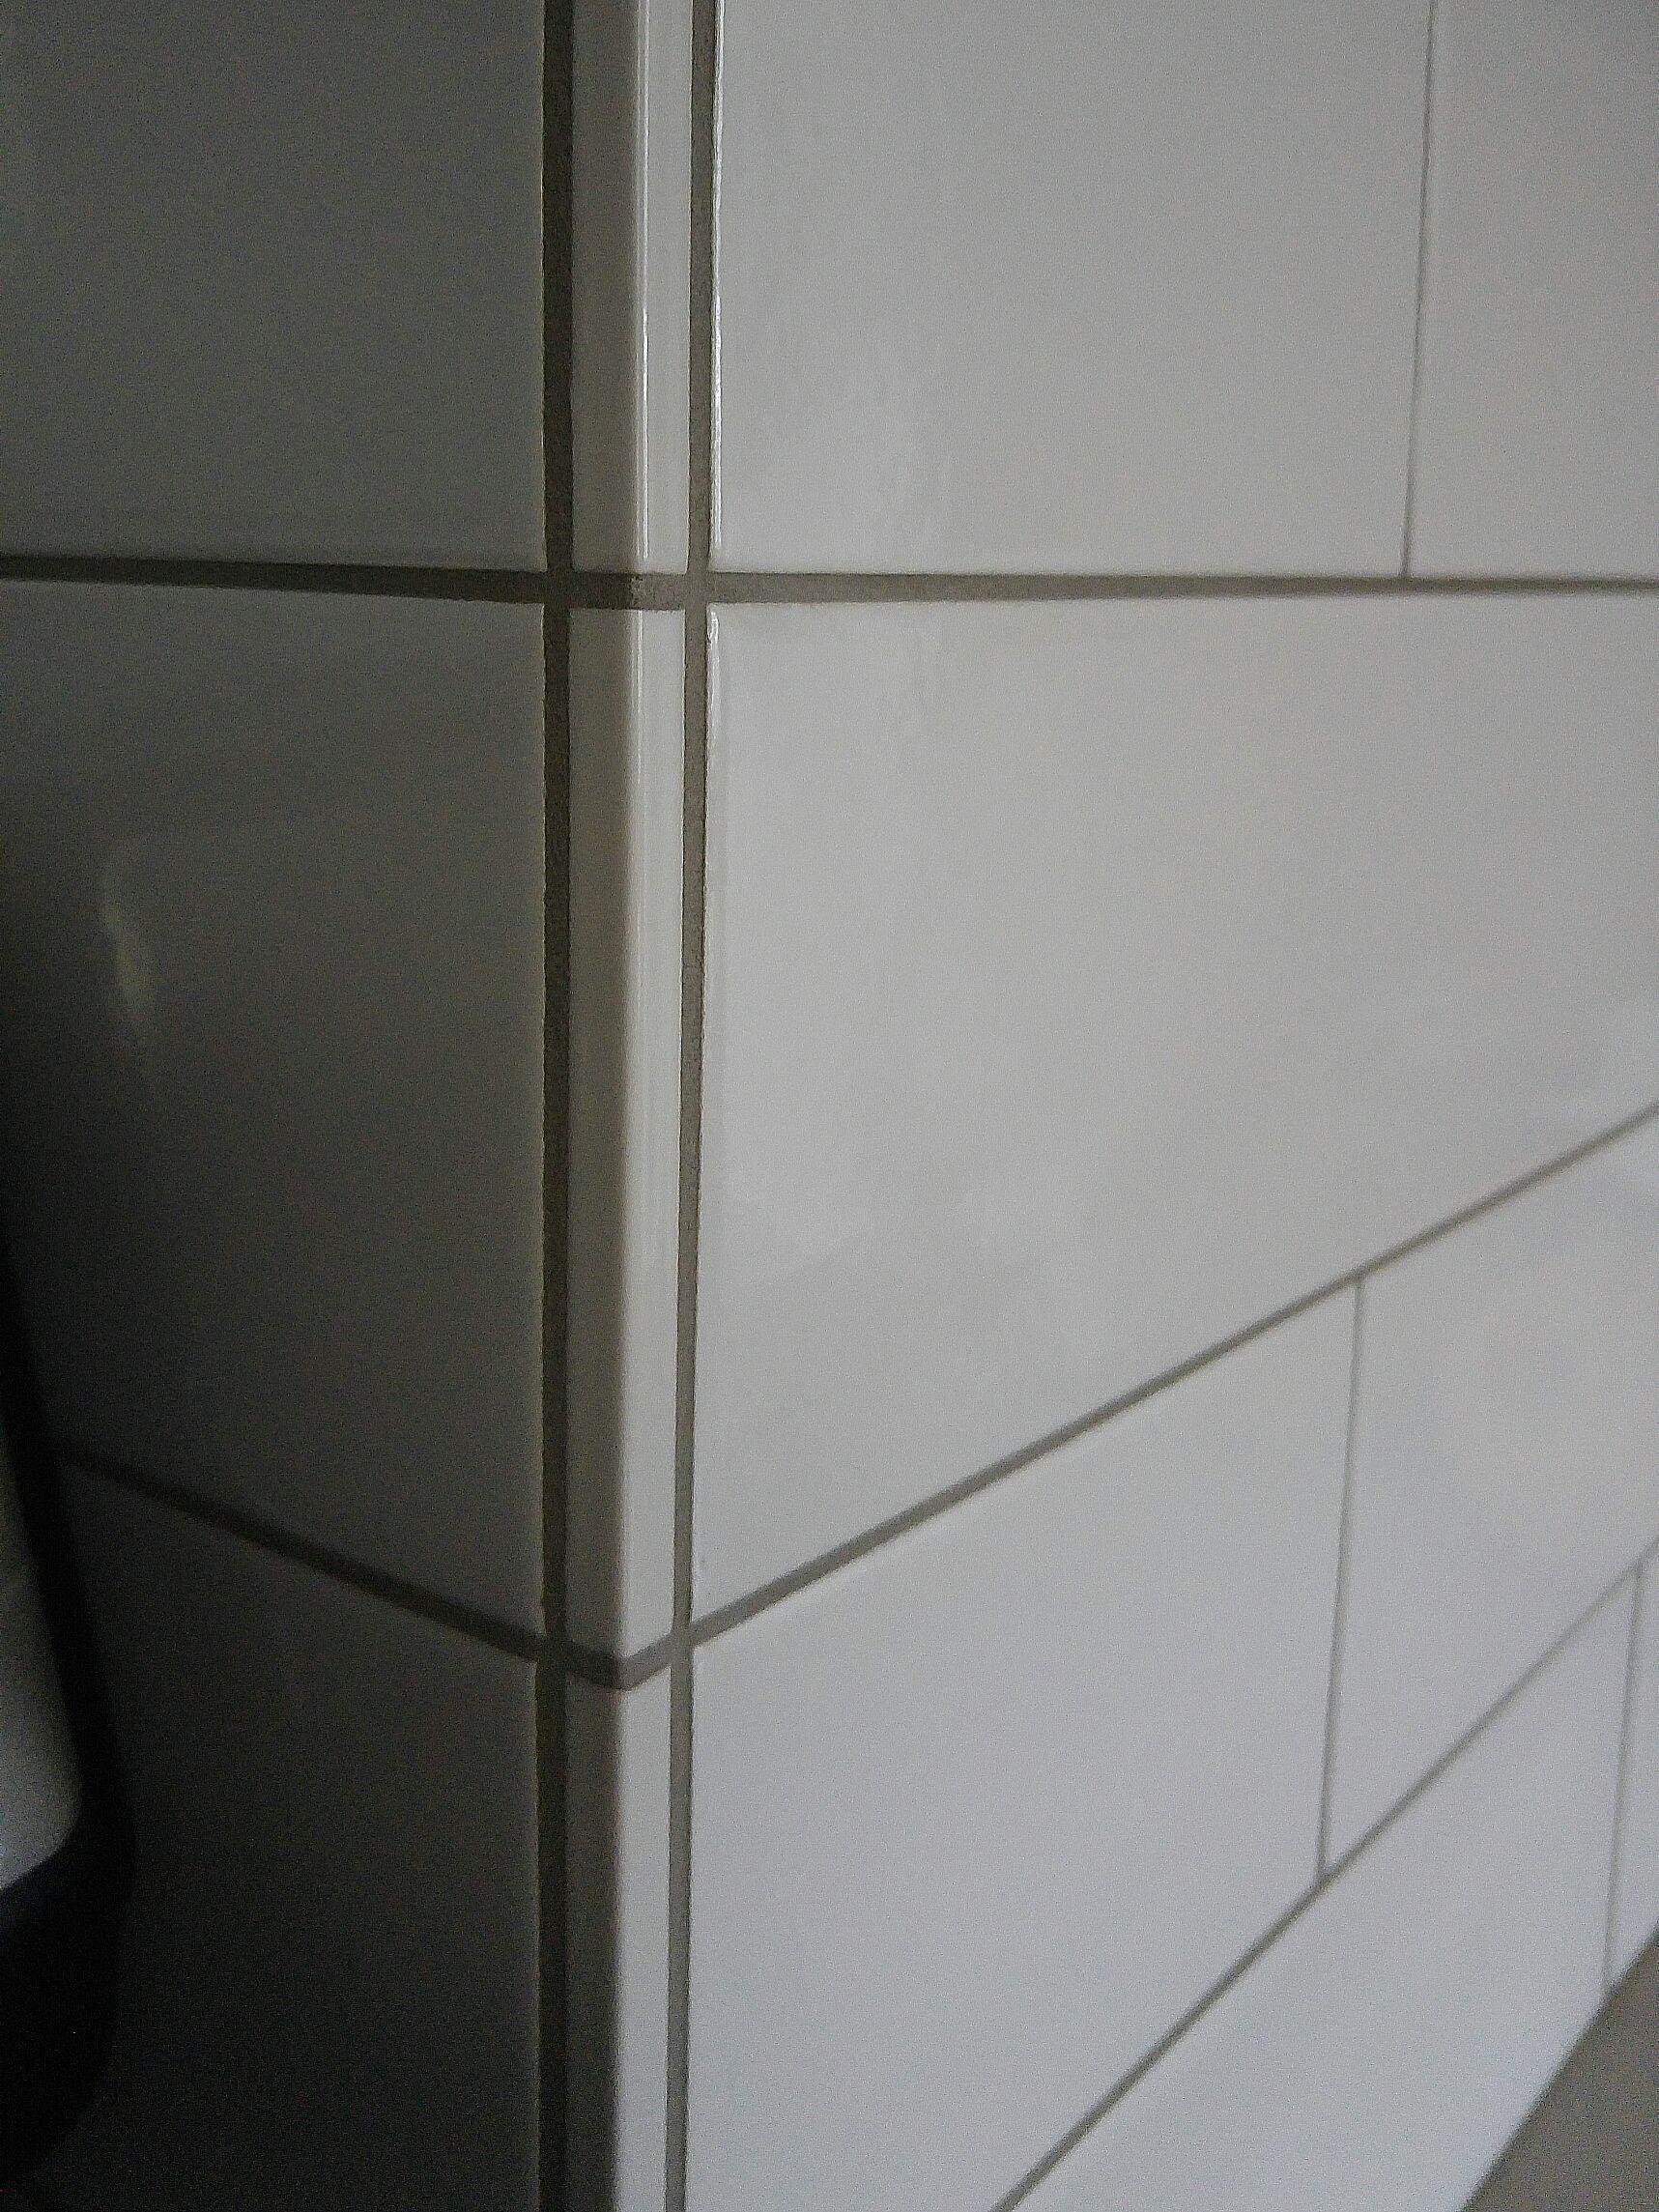 Image Result For Subway Tile Corner Pieces Bullnose Tile Tile Repair Tile Around Window